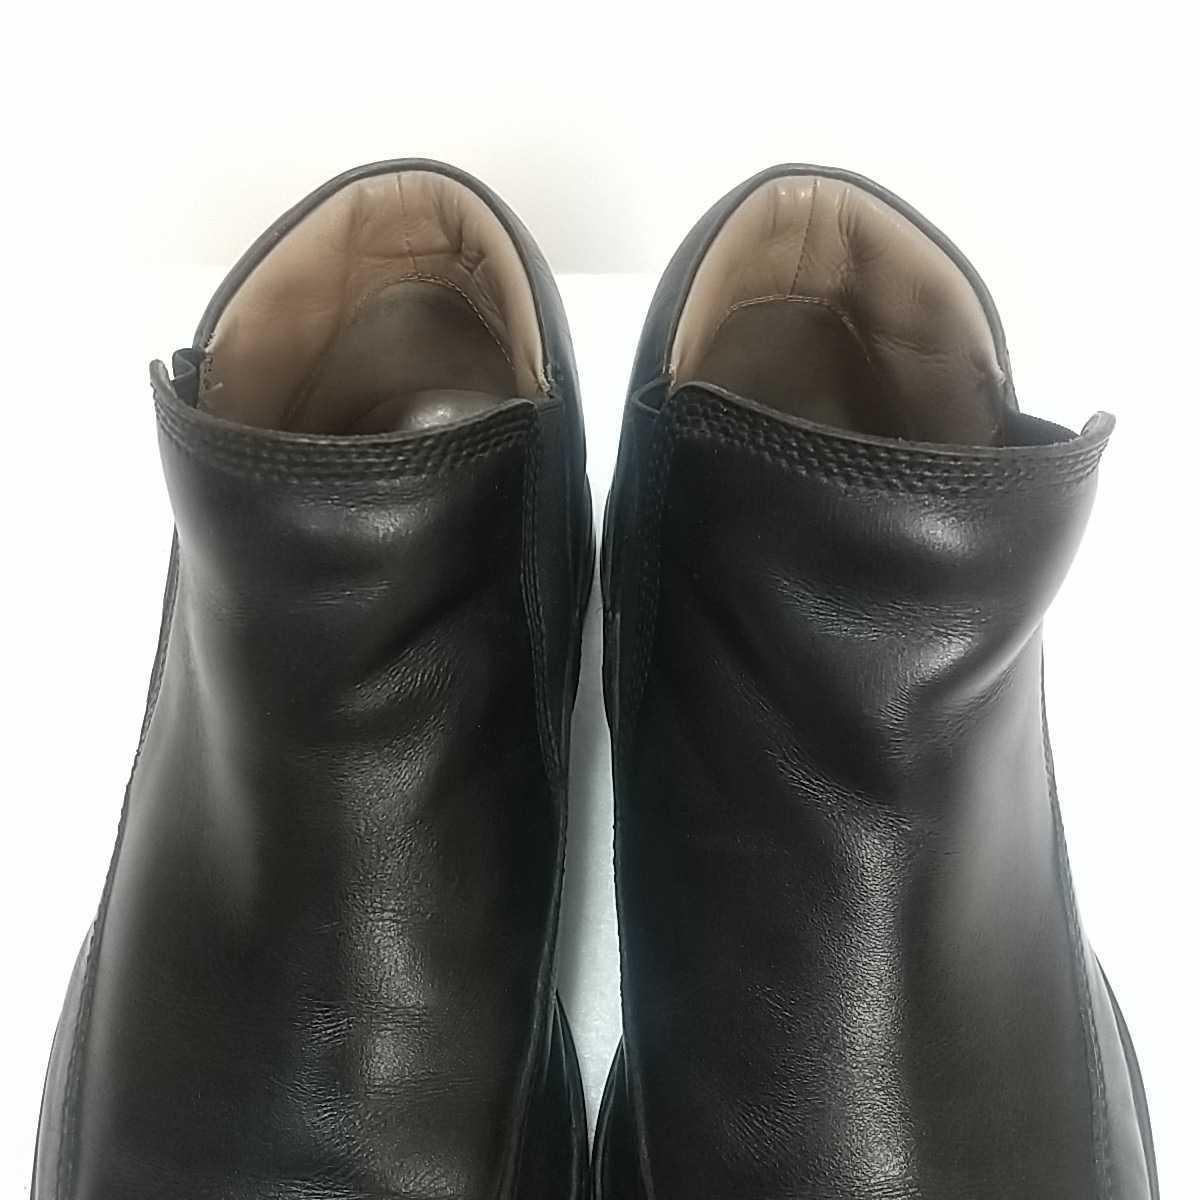 Clarks クラークス レザー サイドゴアブーツ ショート UK9 27.5cm 黒 ブラック 革靴 _画像3